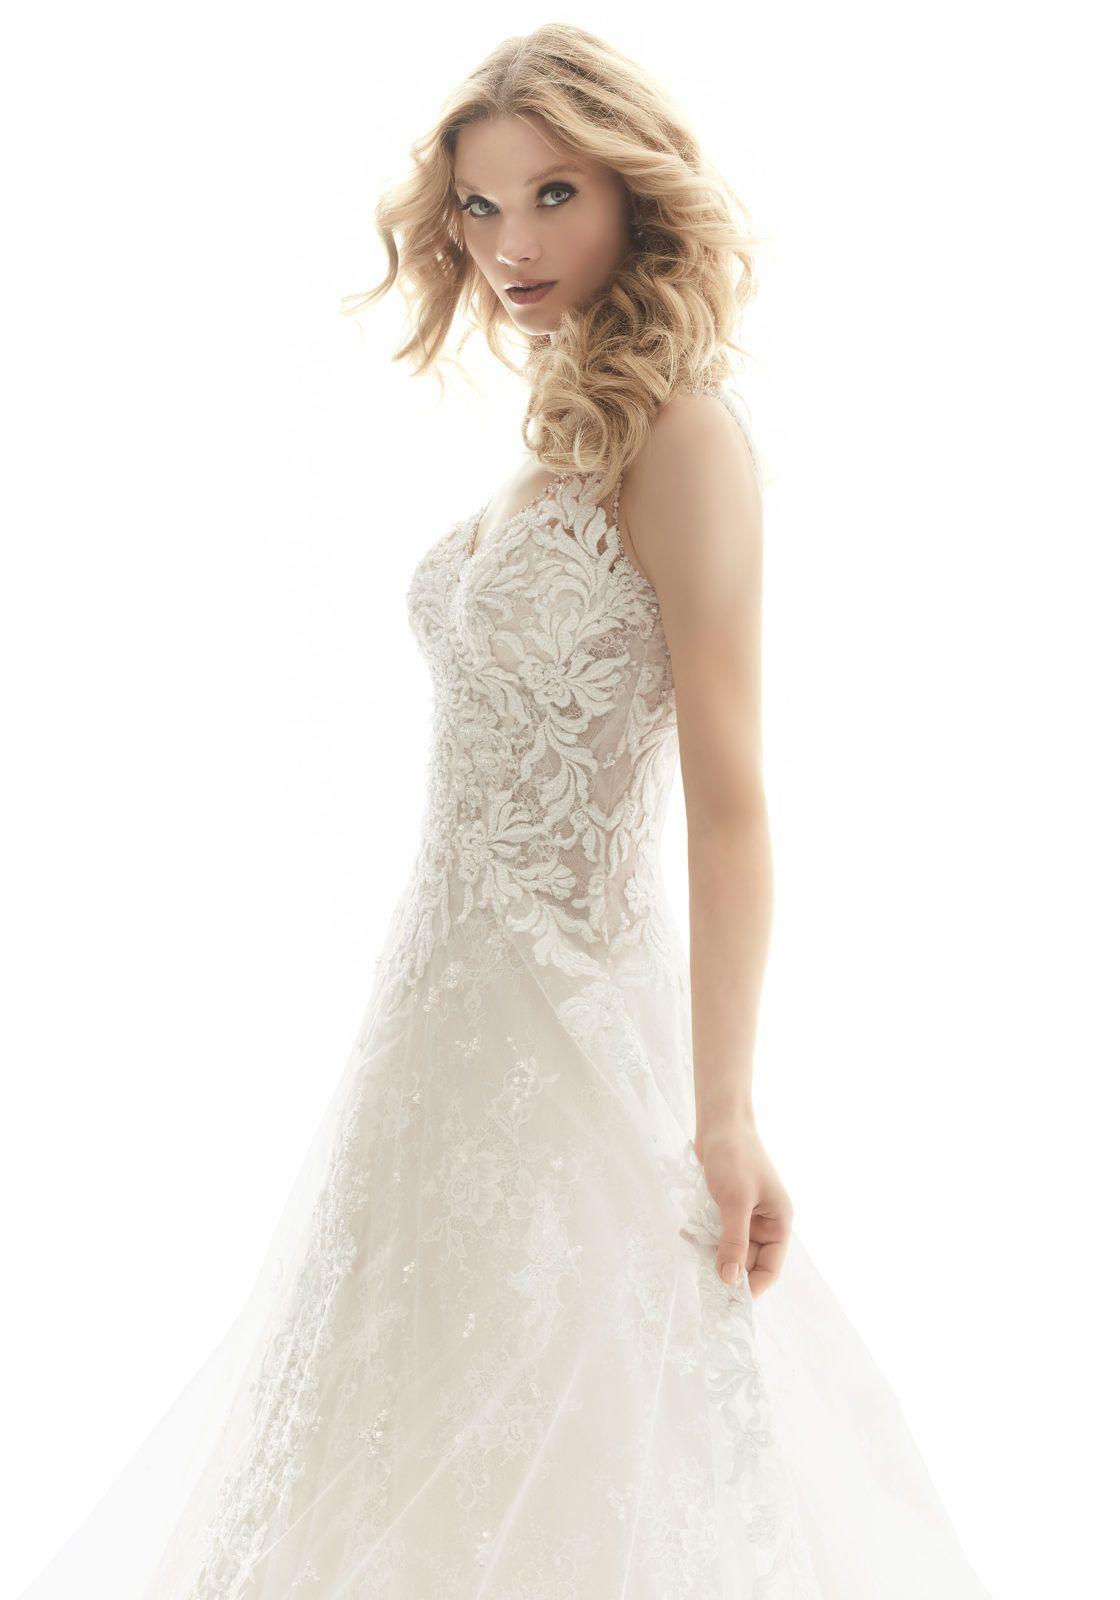 Alicia Wedding Dress Weddings Wedding Dresses Wedding Wedding